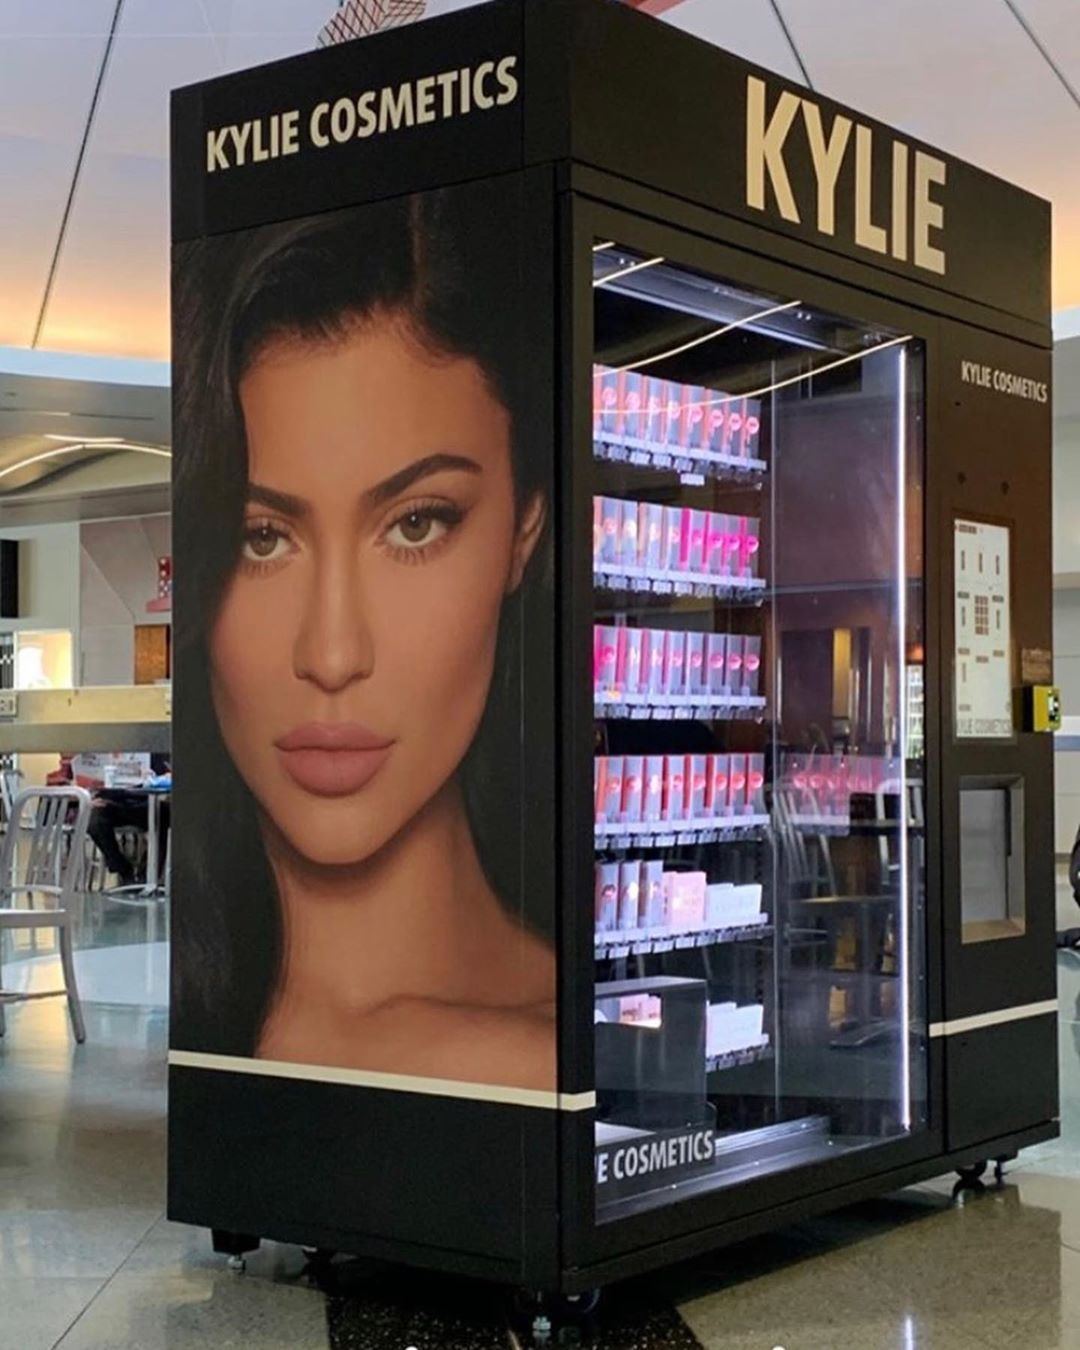 Kylie Cosmetics vending machine at the McCarren